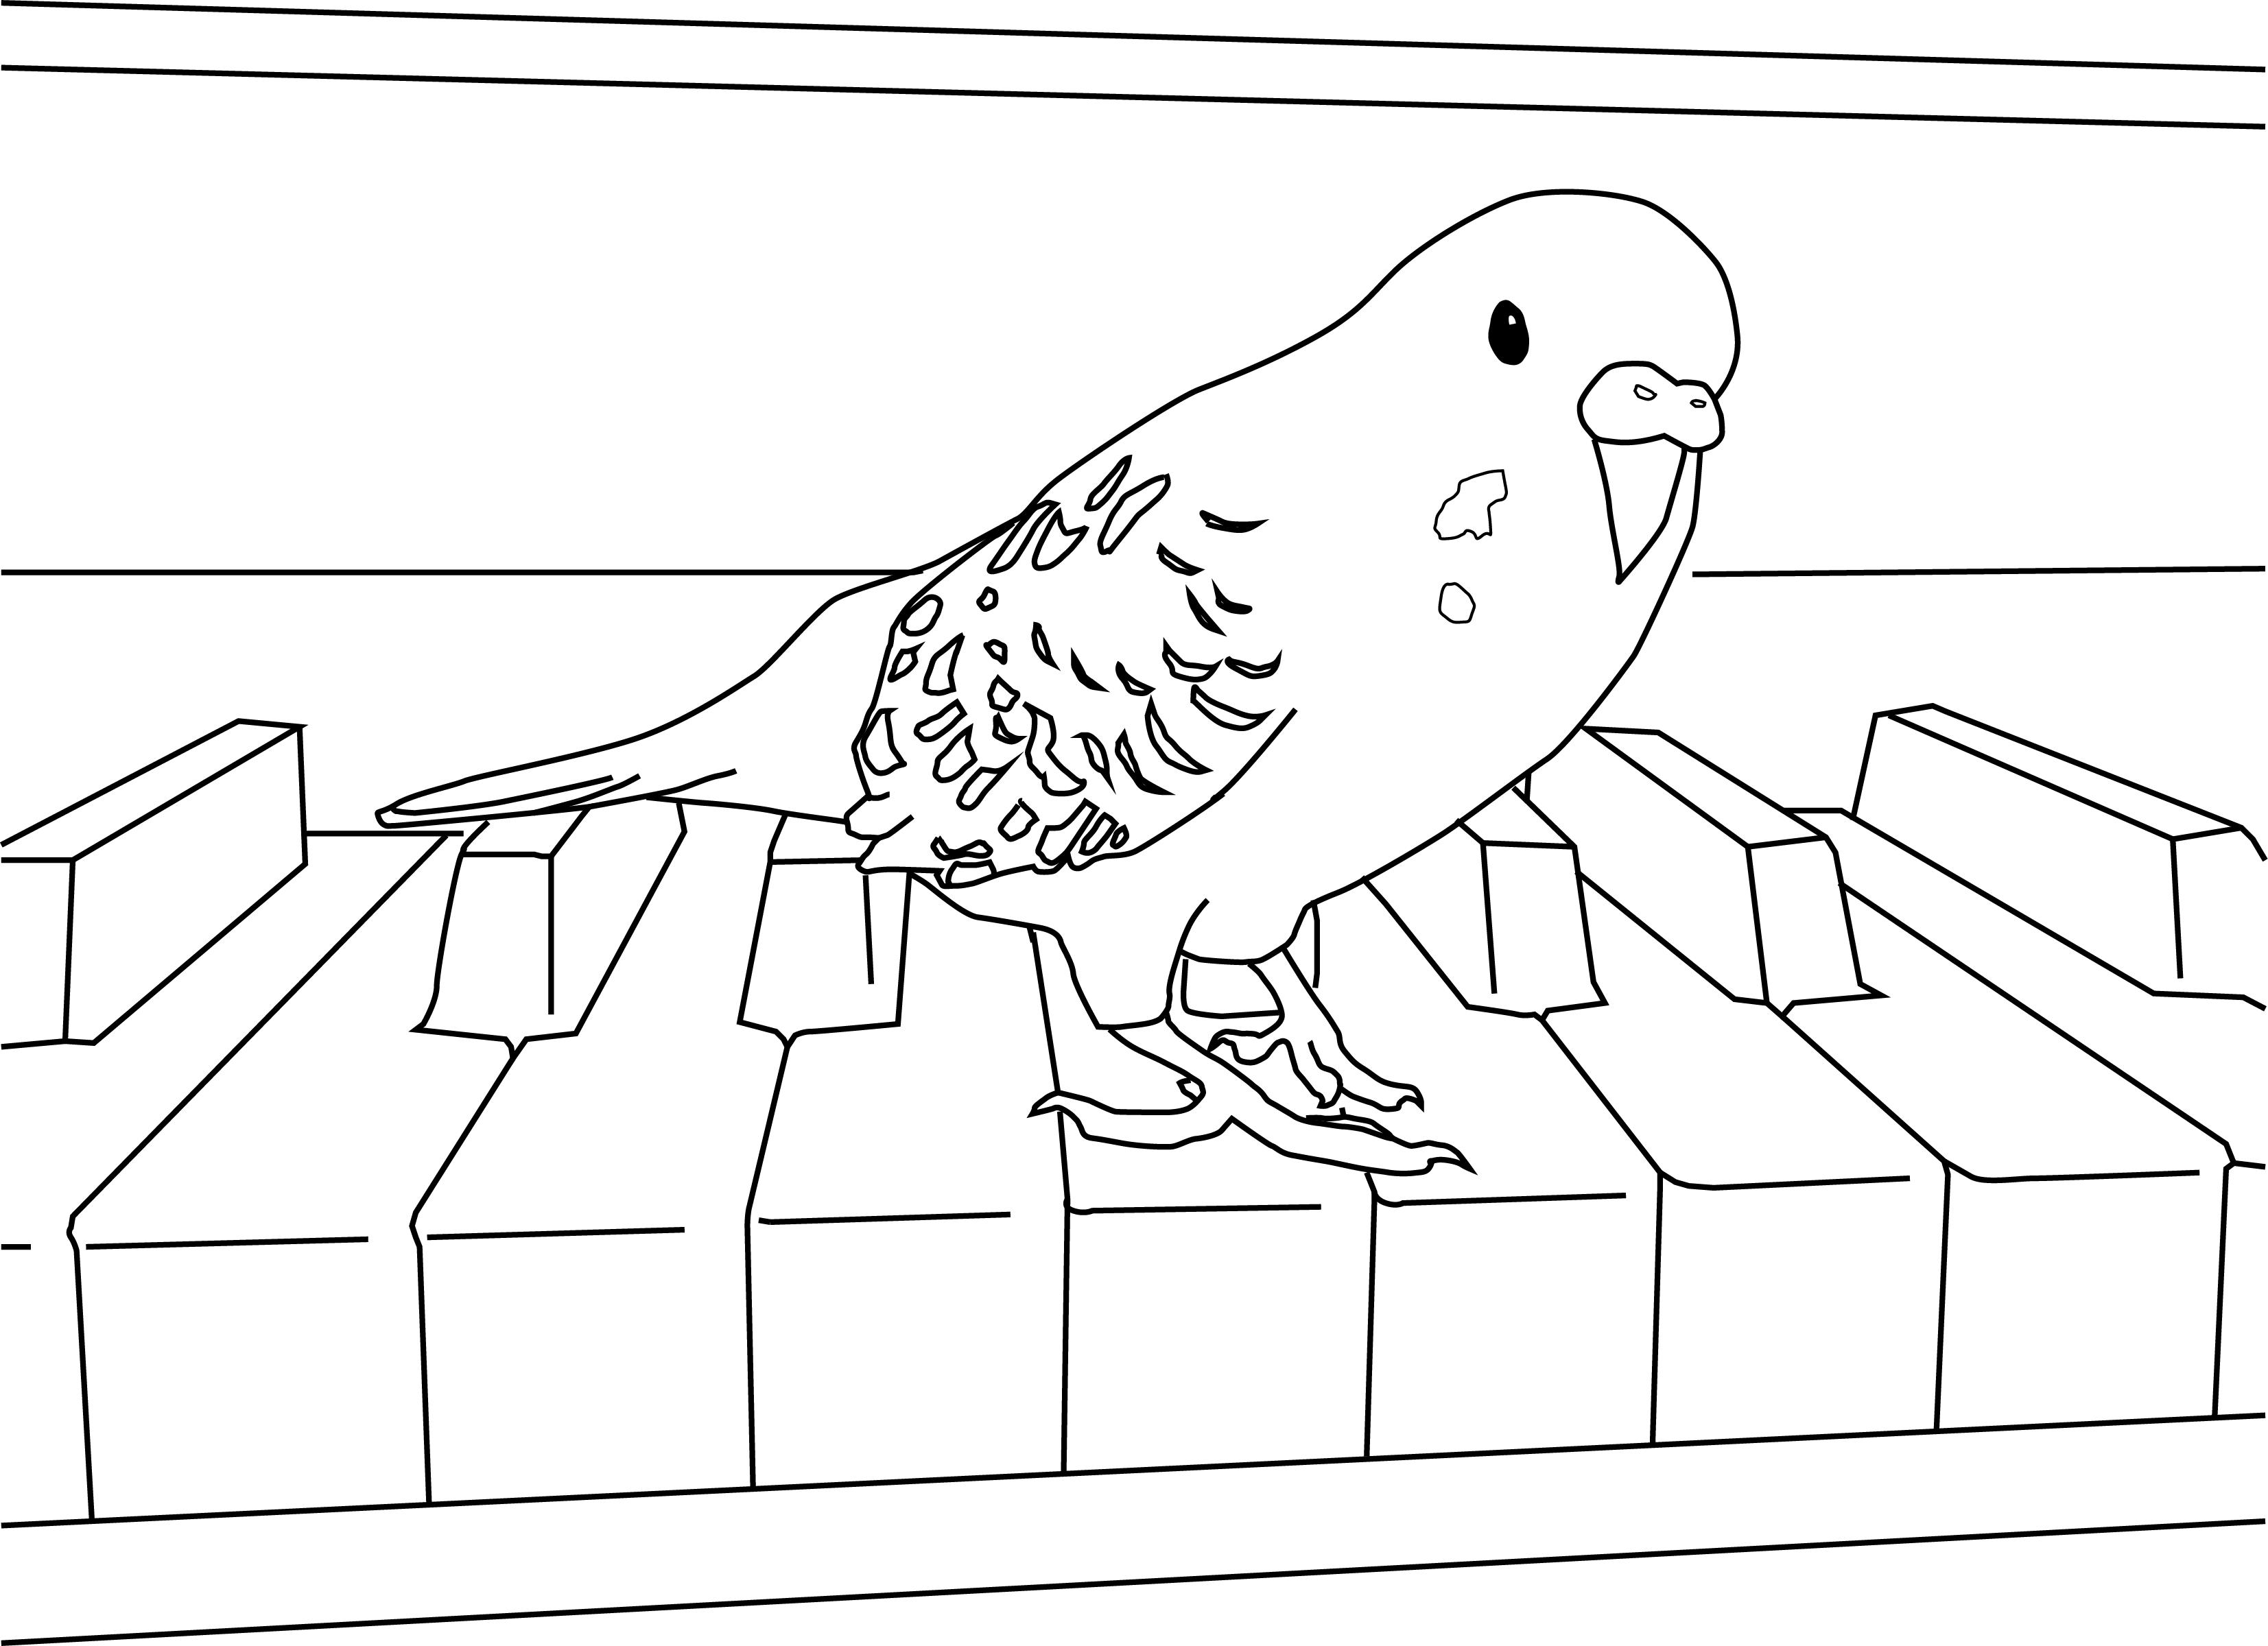 Parakeet coloring #8, Download drawings